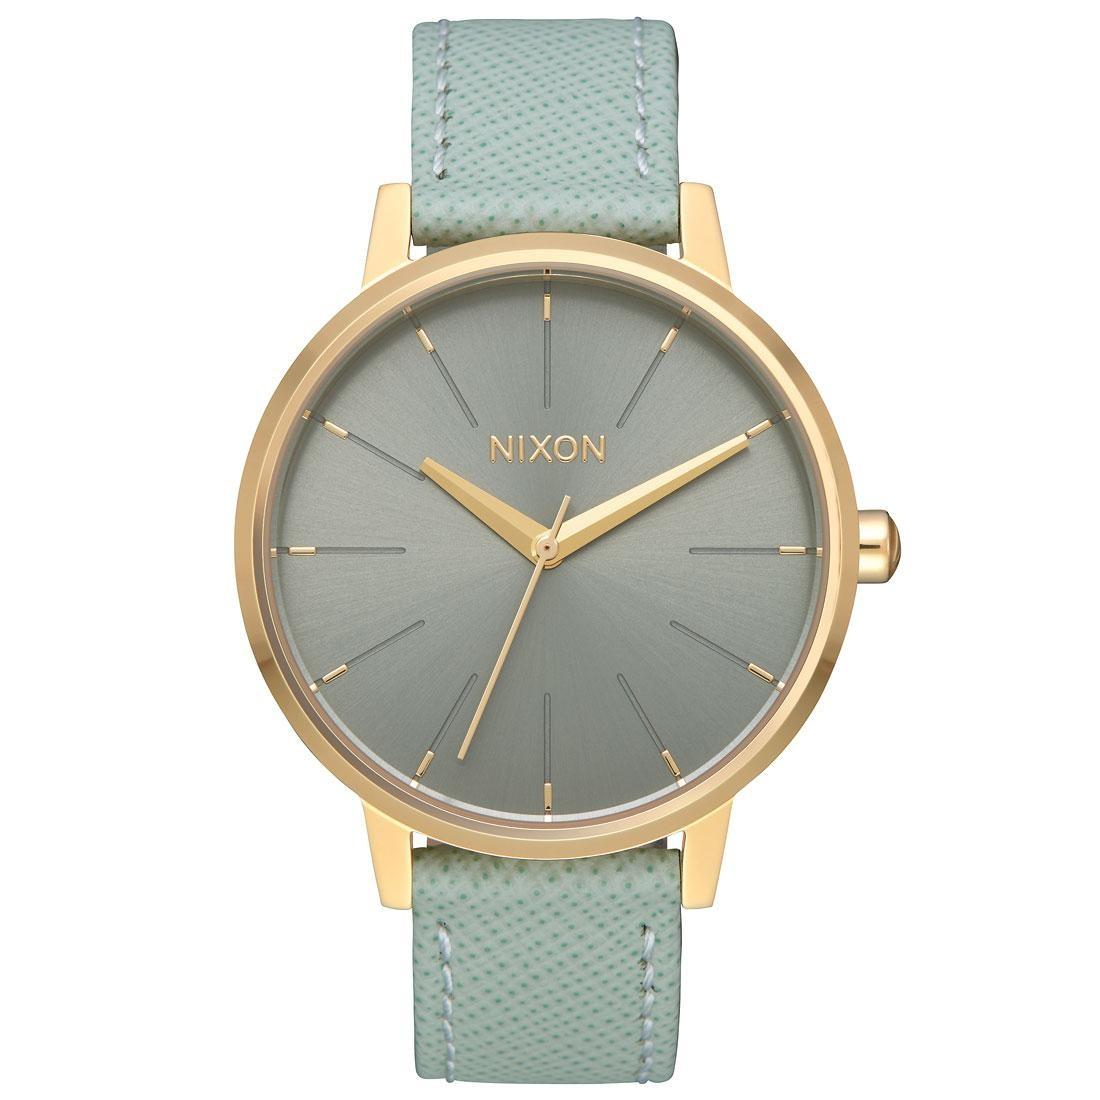 Nixon Kensington Leather Watch (gold / light / agave)